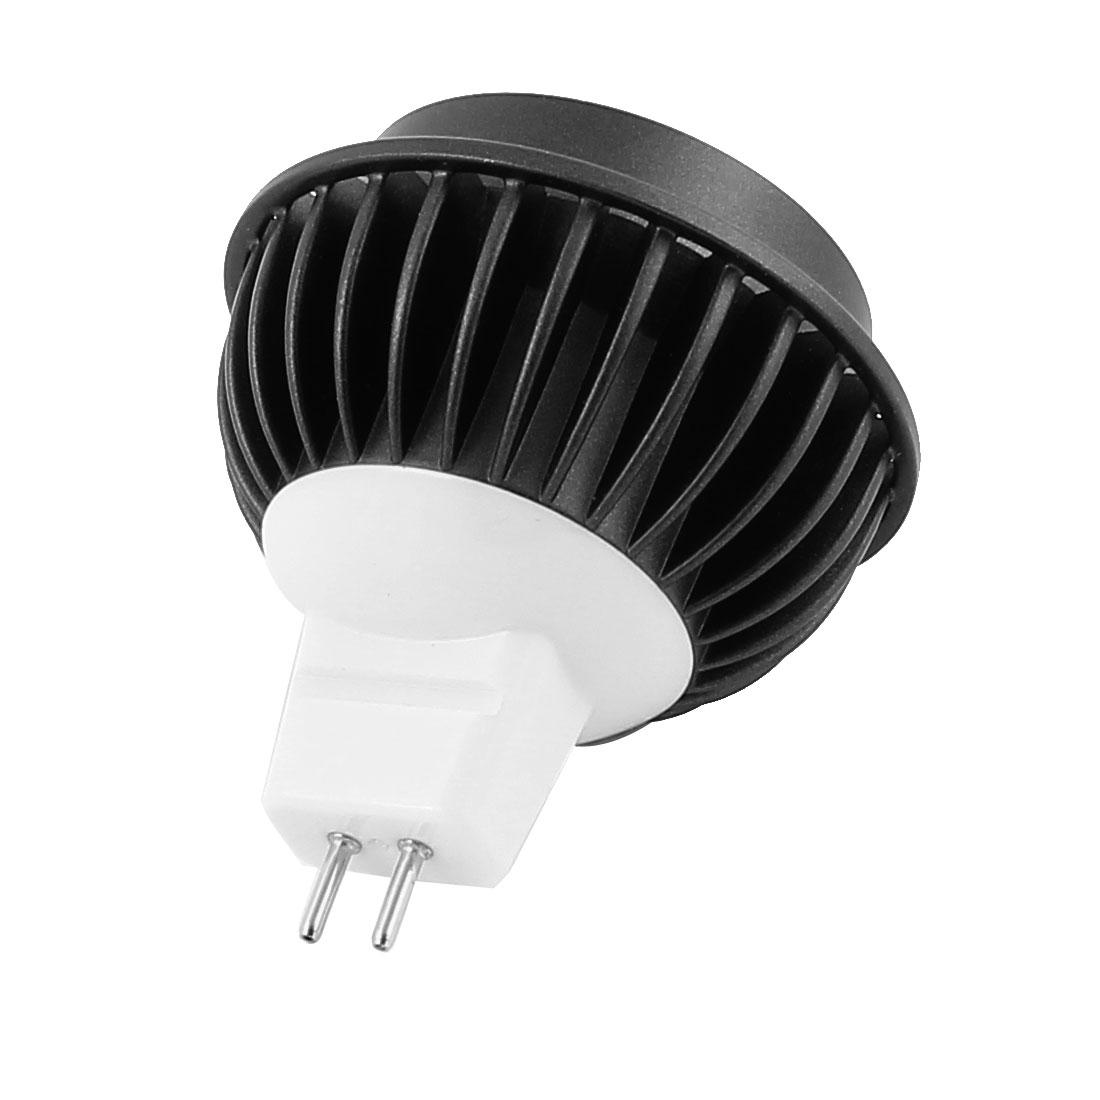 DC12V-3W-Power-MR16-COB-Integrated-Chip-LED-Spotlight-Lamp-Downlight-Warm-White